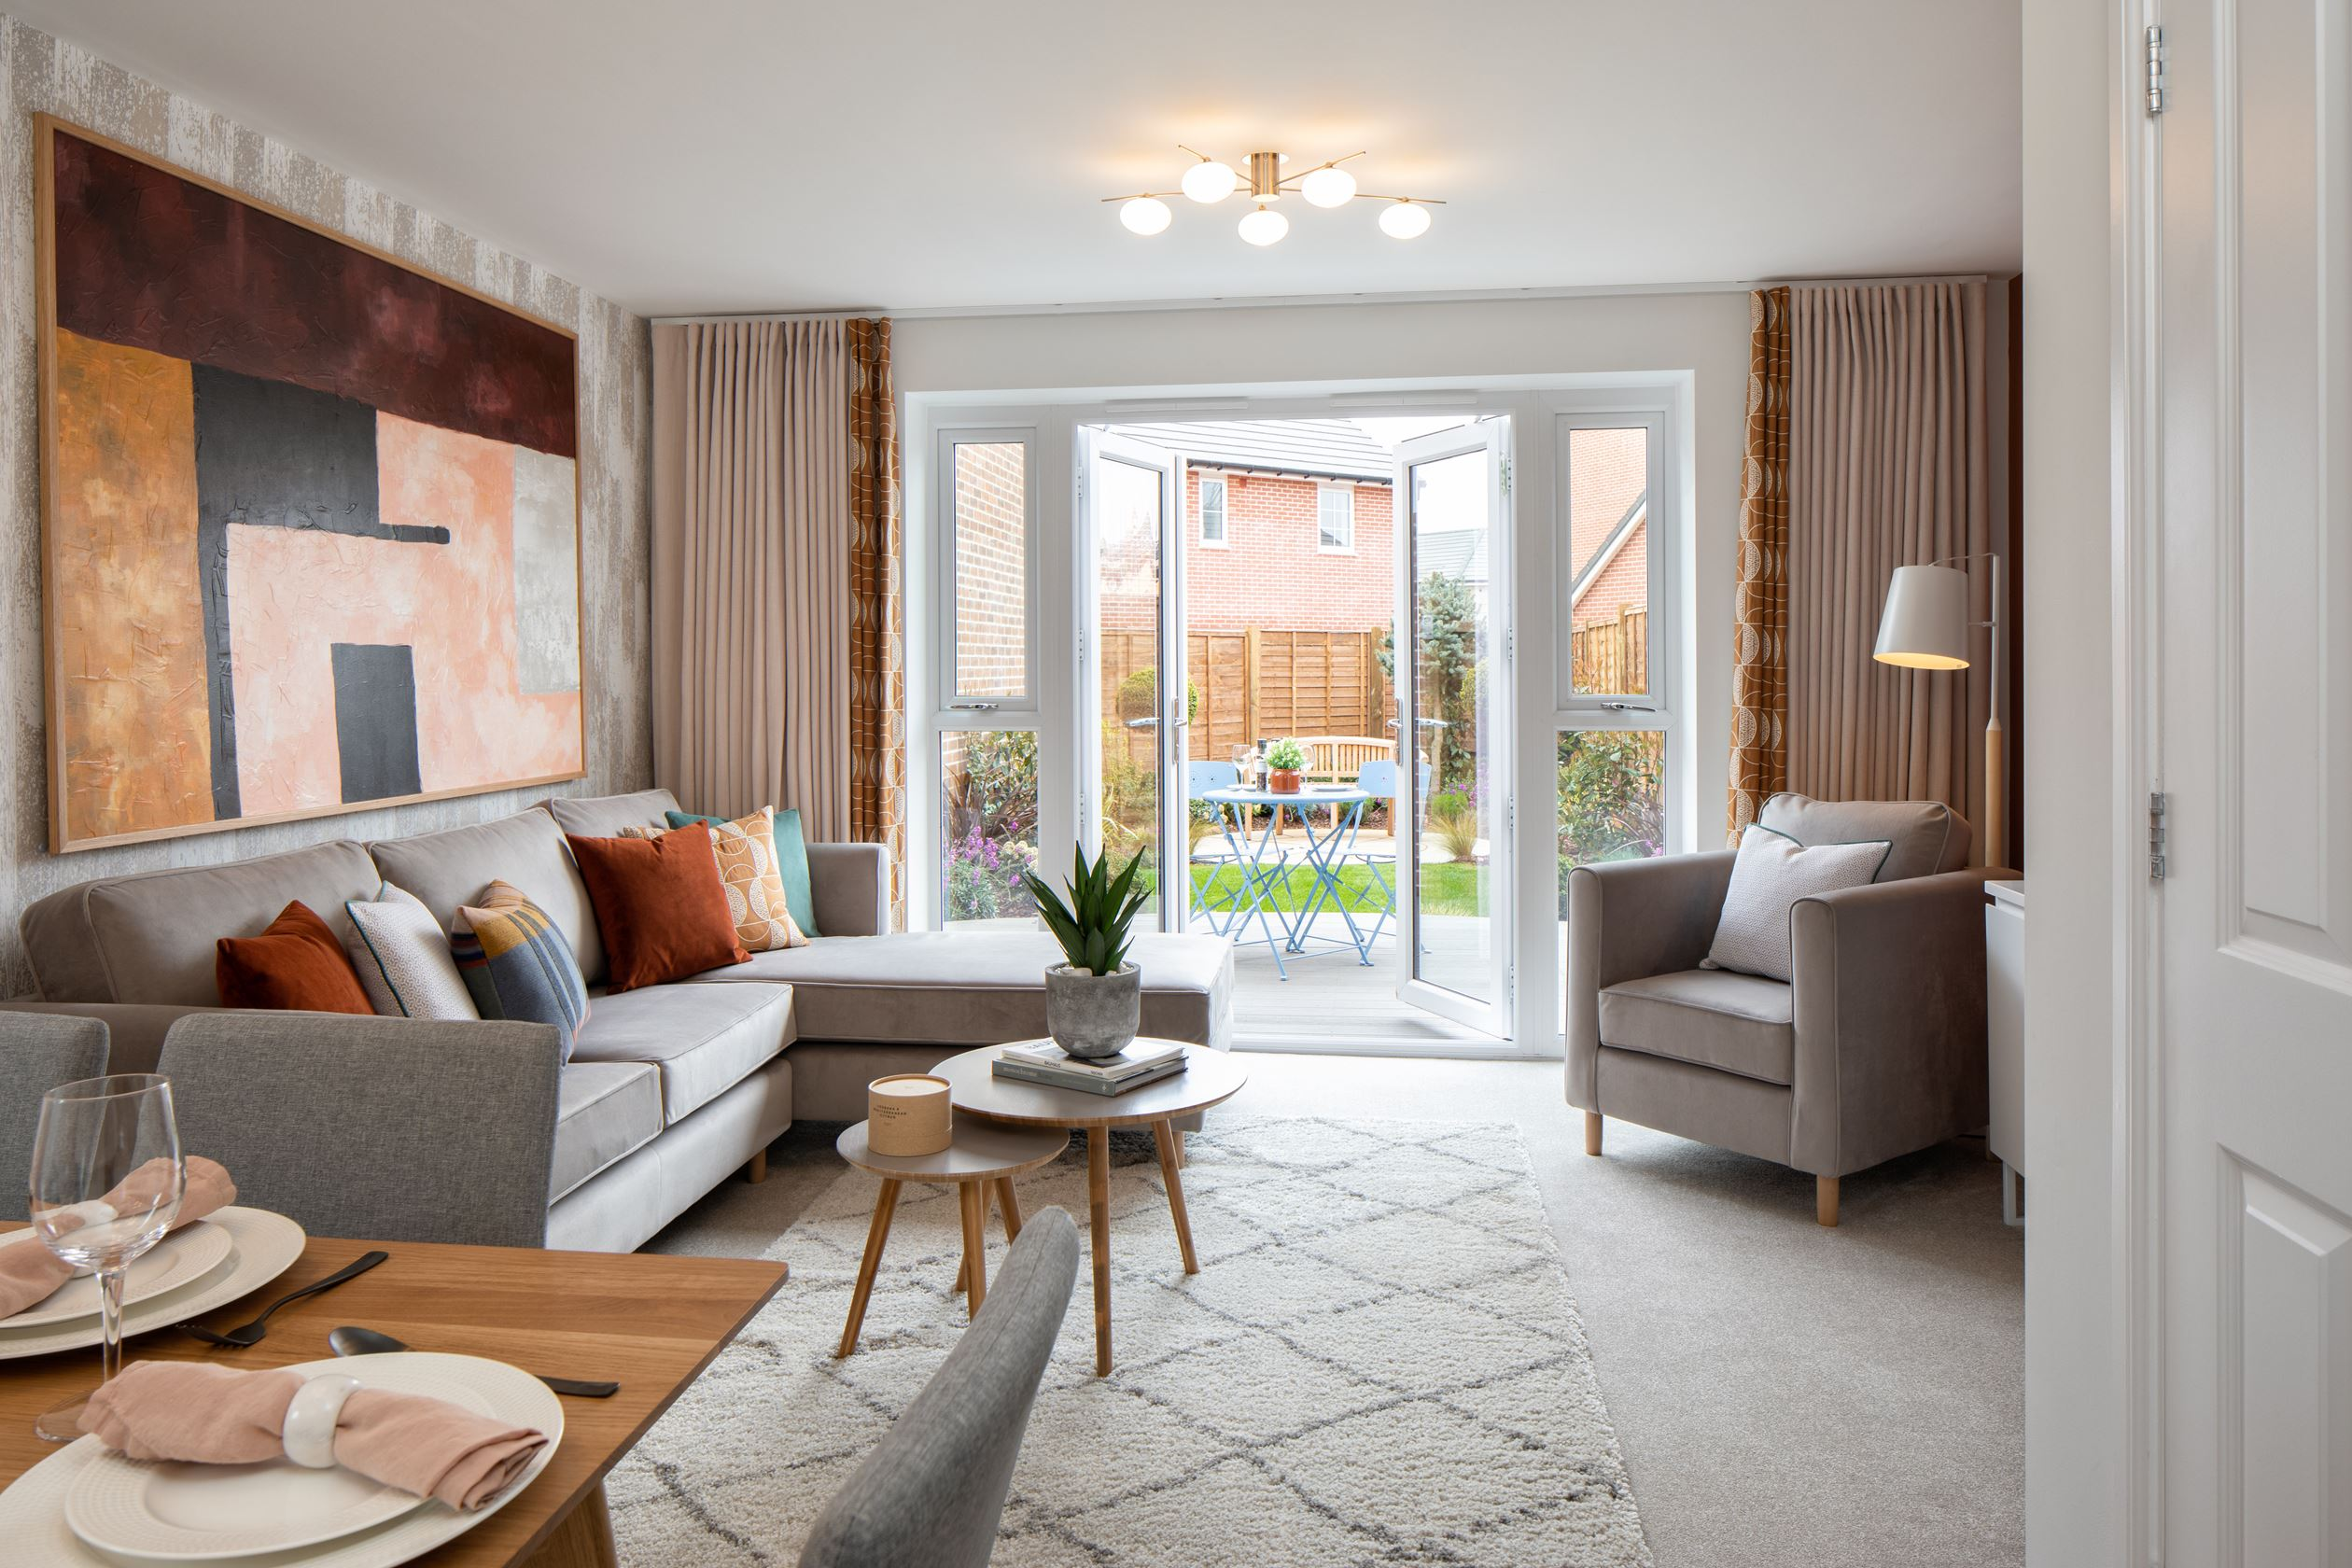 david wilson homes interior design ideas